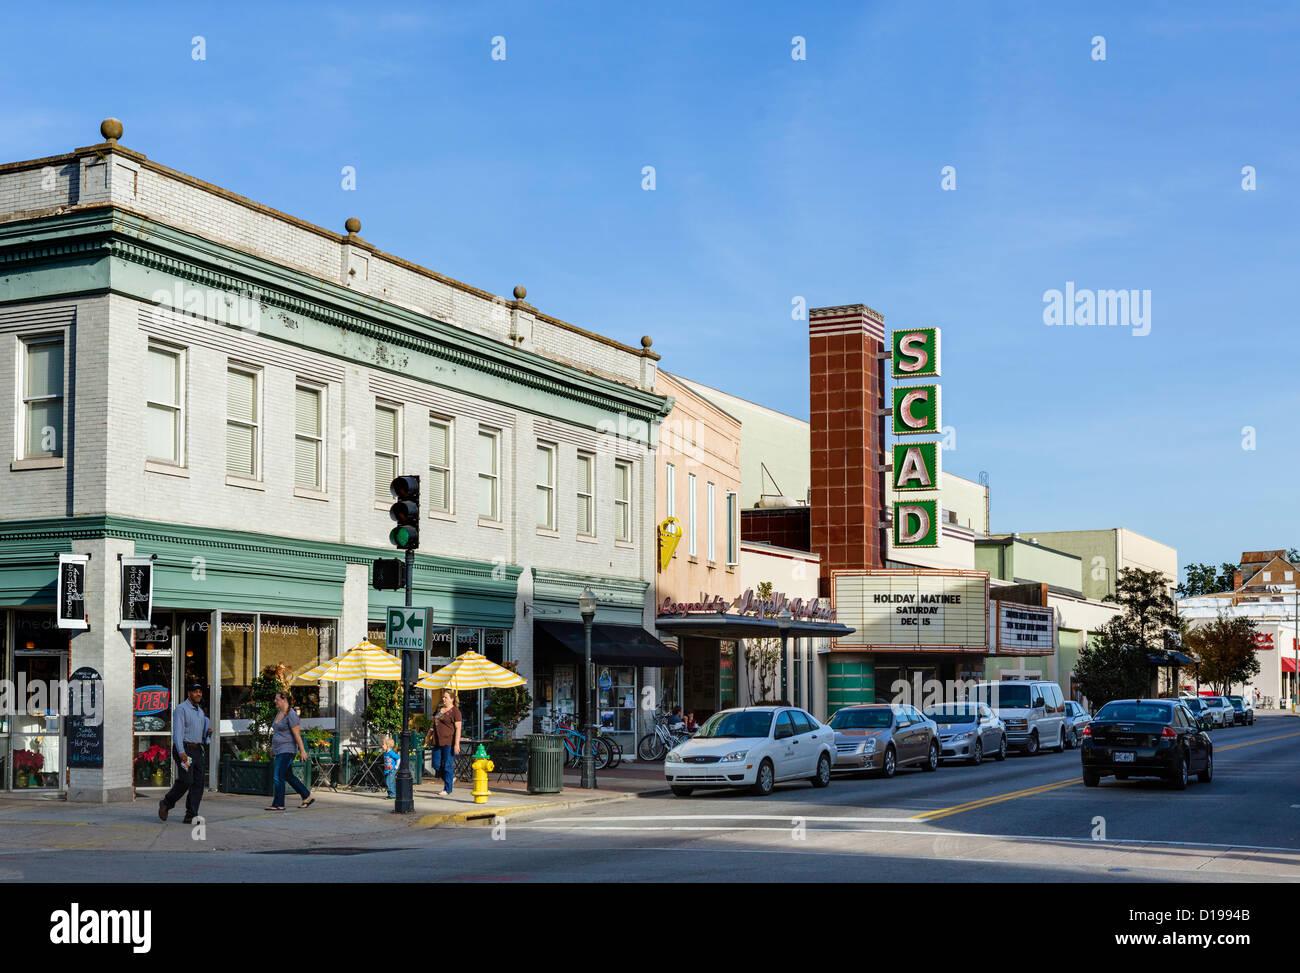 Shops on East Broughton Street in historic downtown Savannah, Georgia, USA - Stock Image